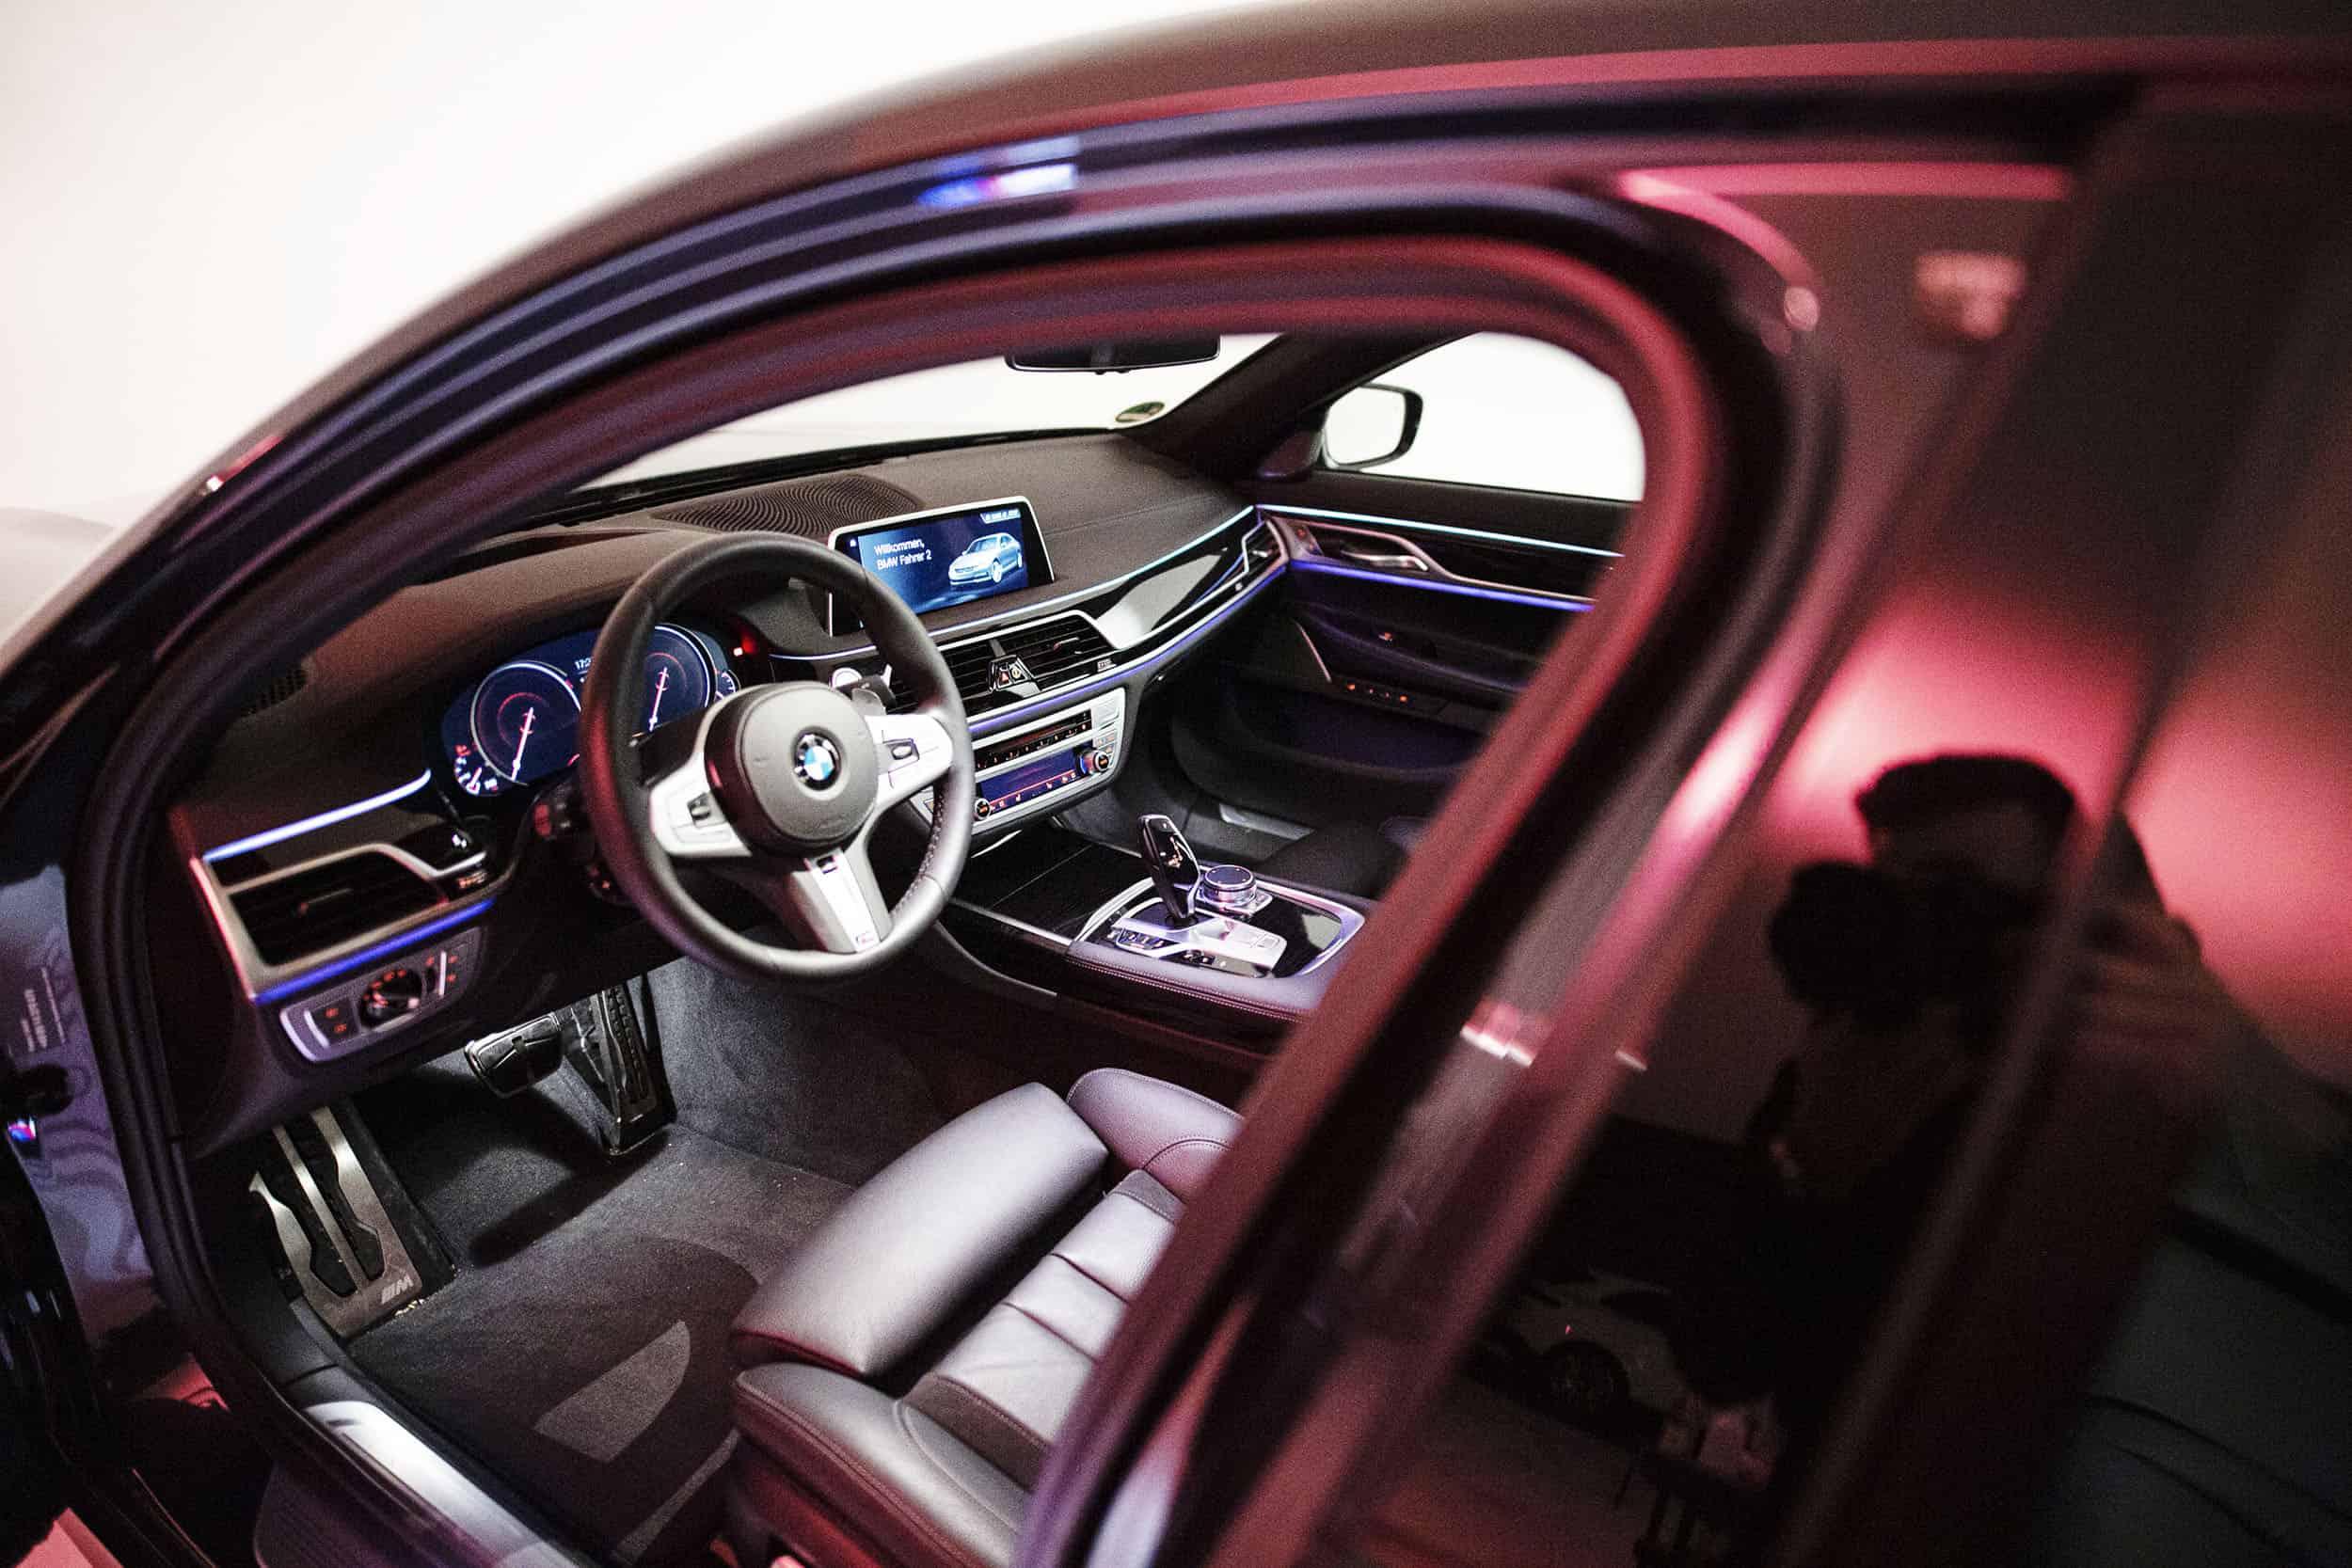 studio-ignatov-wkw-automotive-imagekampagne-makingof-05